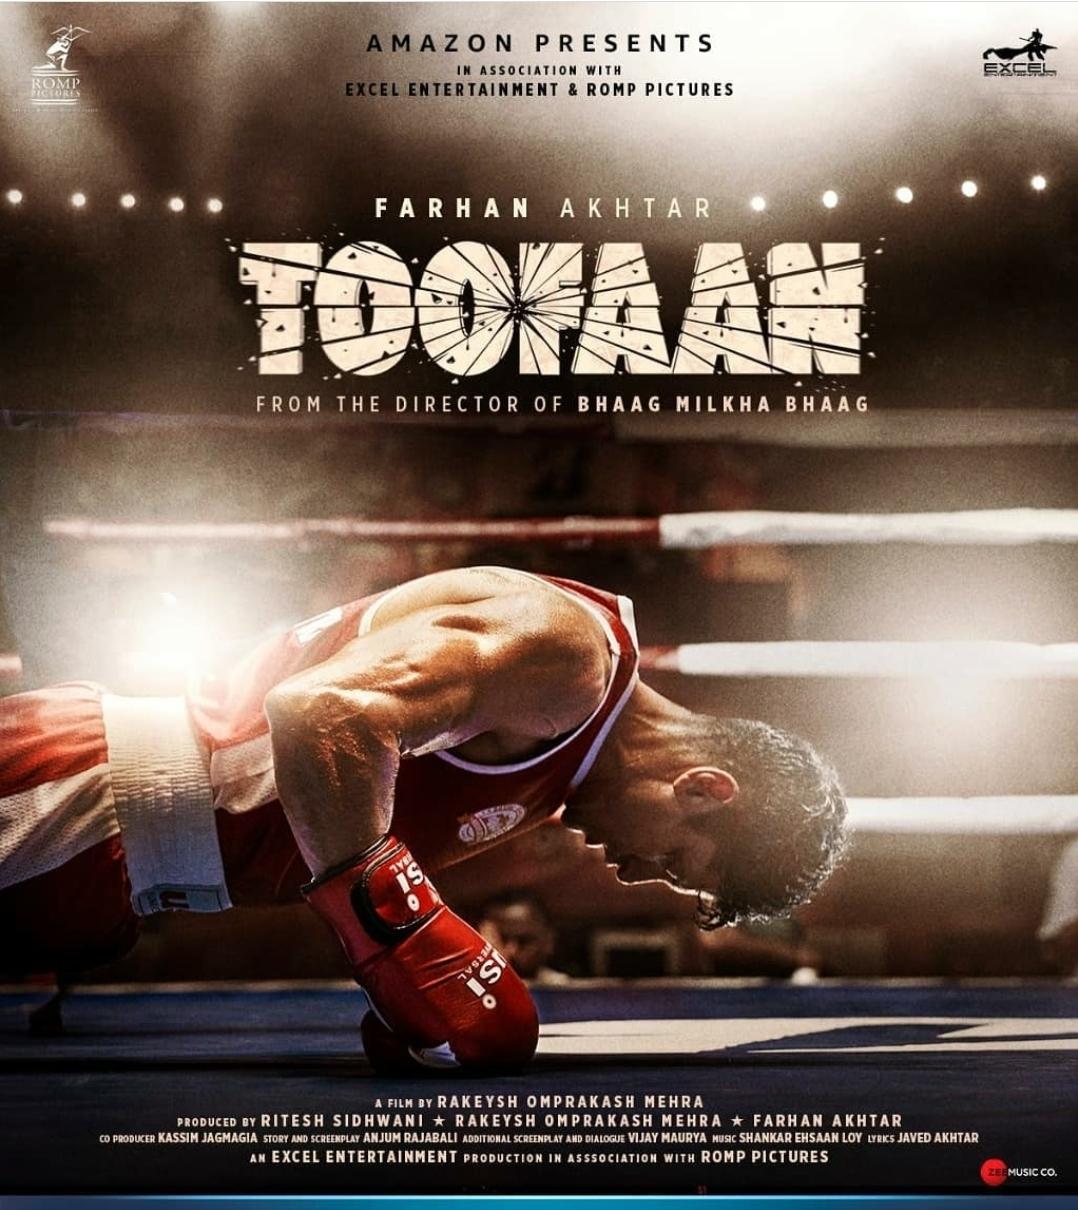 Check the astonishing posters of Farhan Akhtar's 'Toofan' - Bollywood News - IndiaGlitz.com